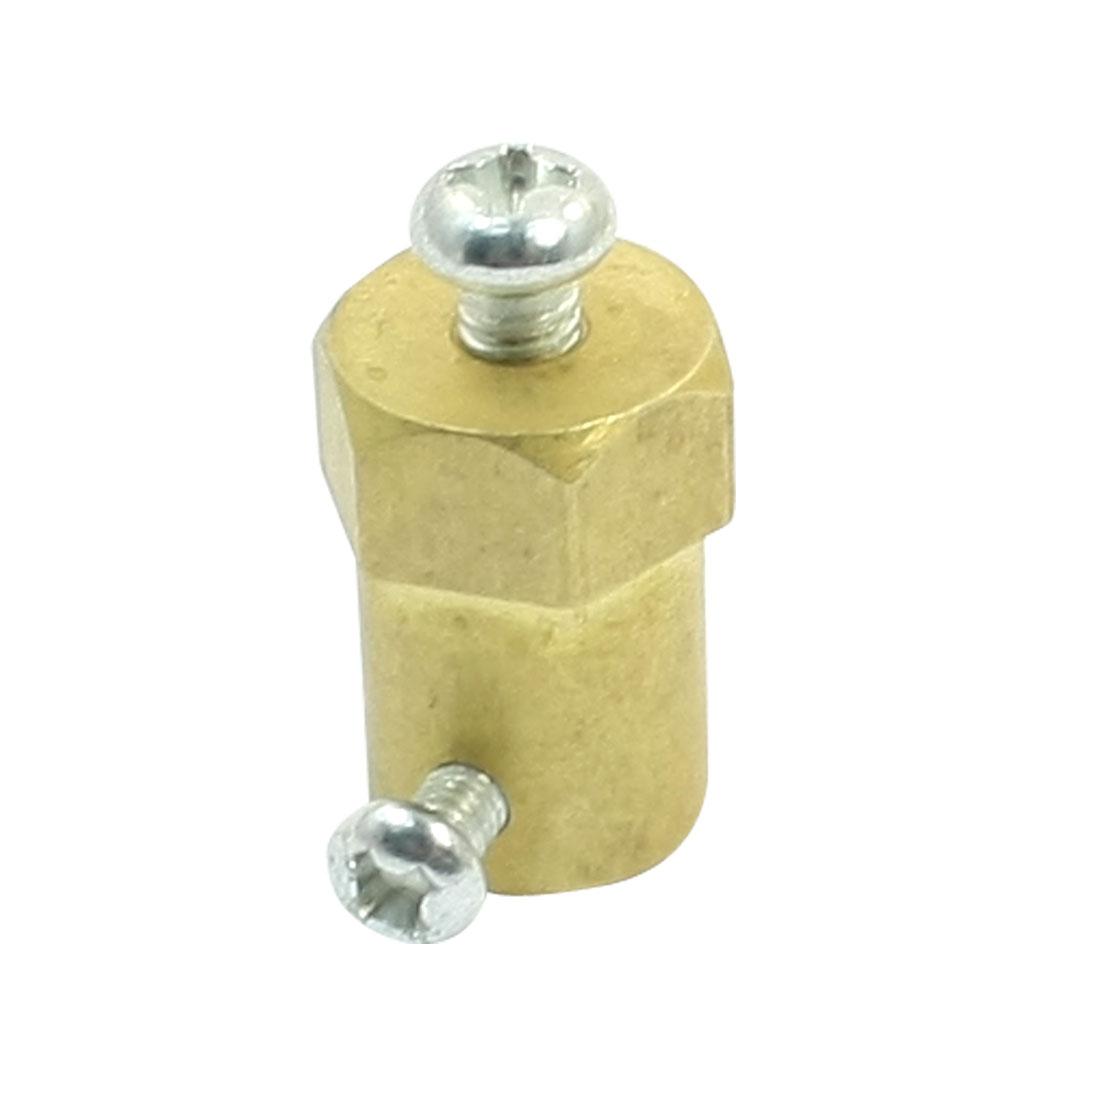 Gold Tone 5mm Shaft Smart Wheels DC Gear Motor Hex Coupling Coupler